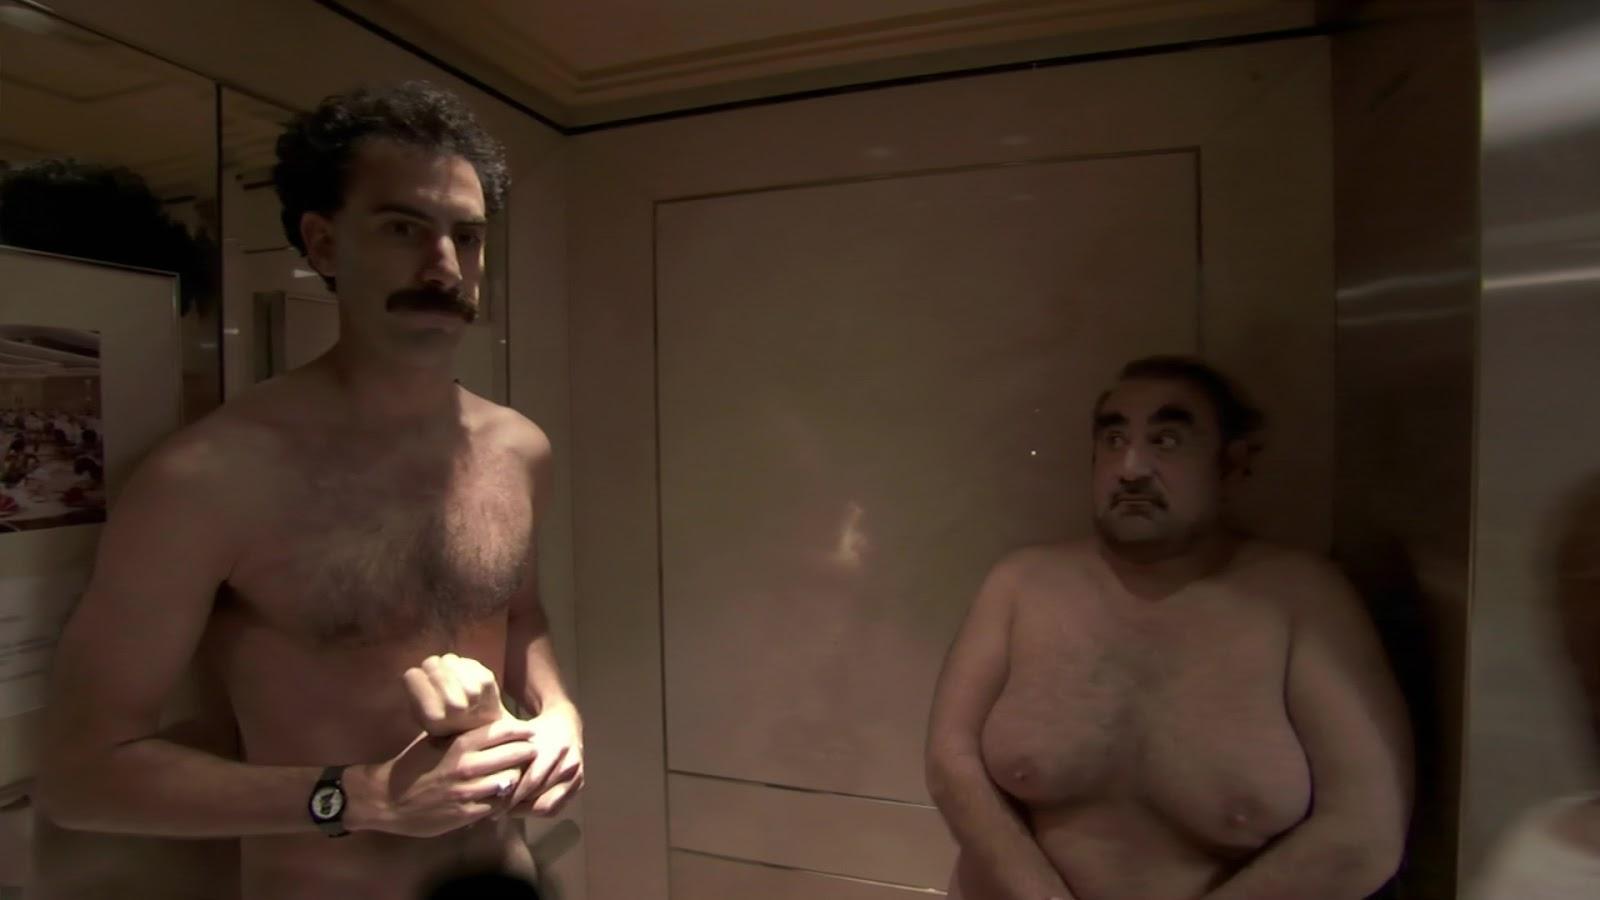 Also borat naked fight scene